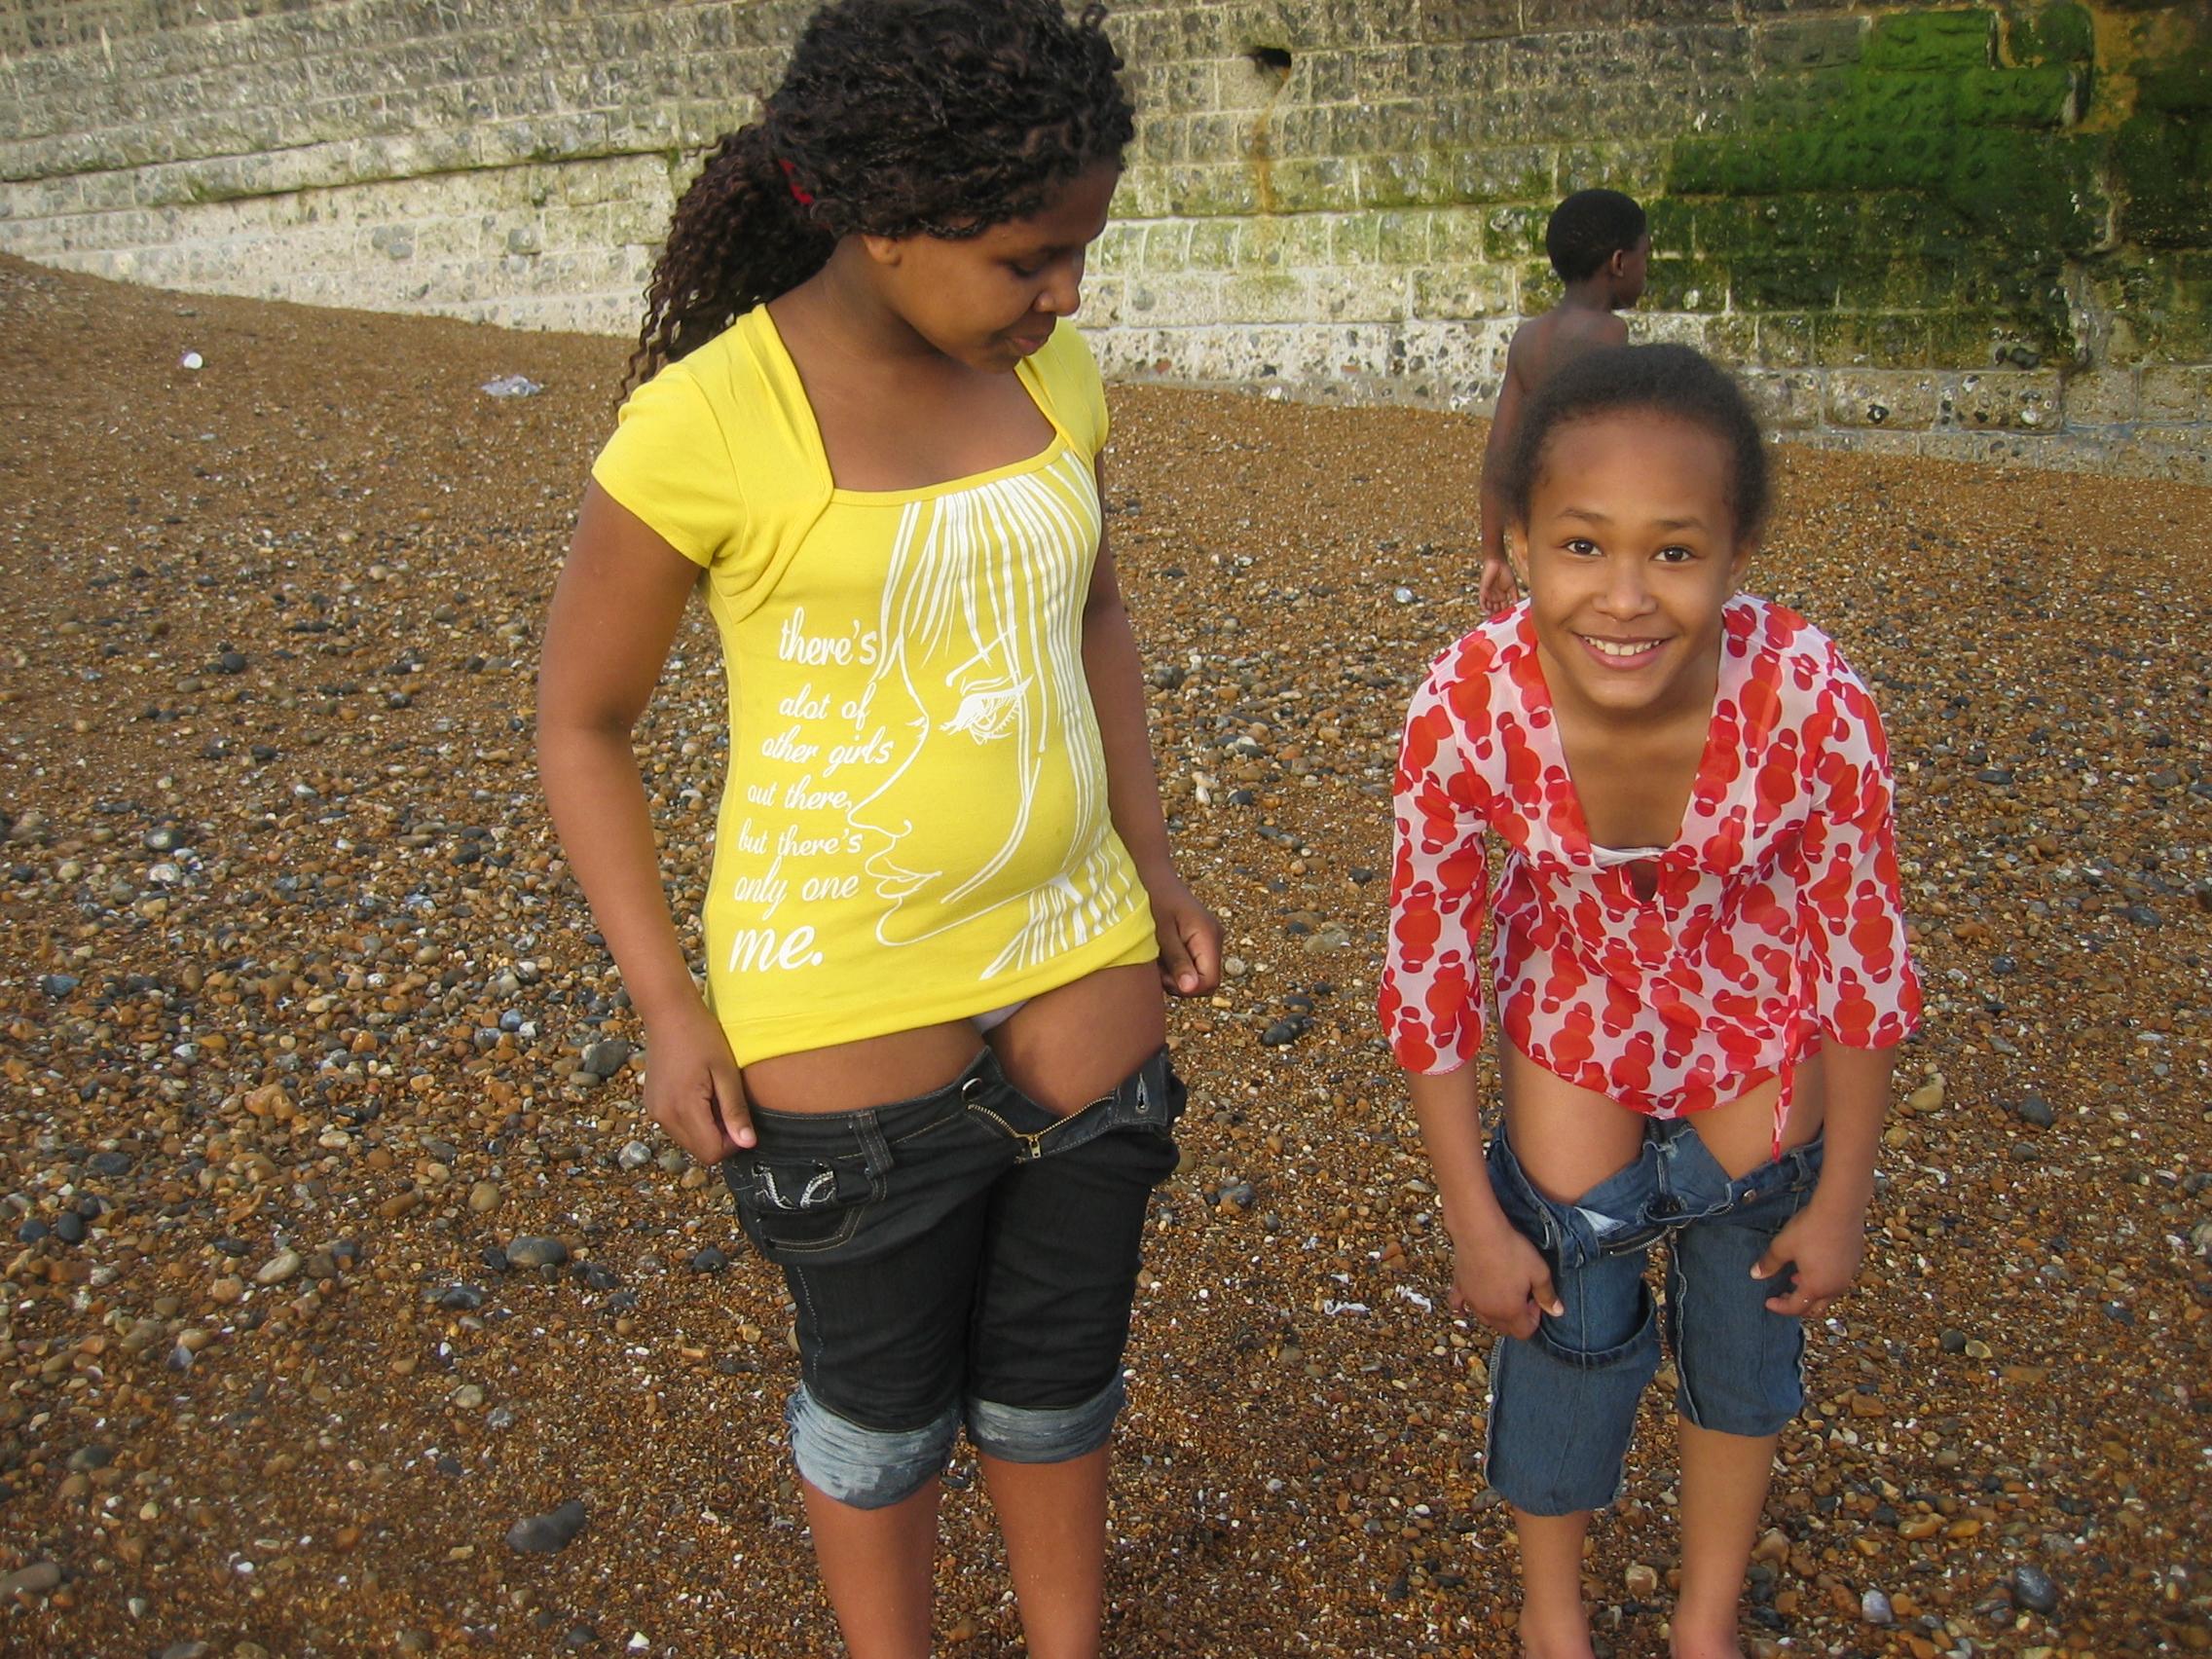 young camel toe Brighton,Mzansi and fun,you go girls 042 | Flickr - Photo Sharing!